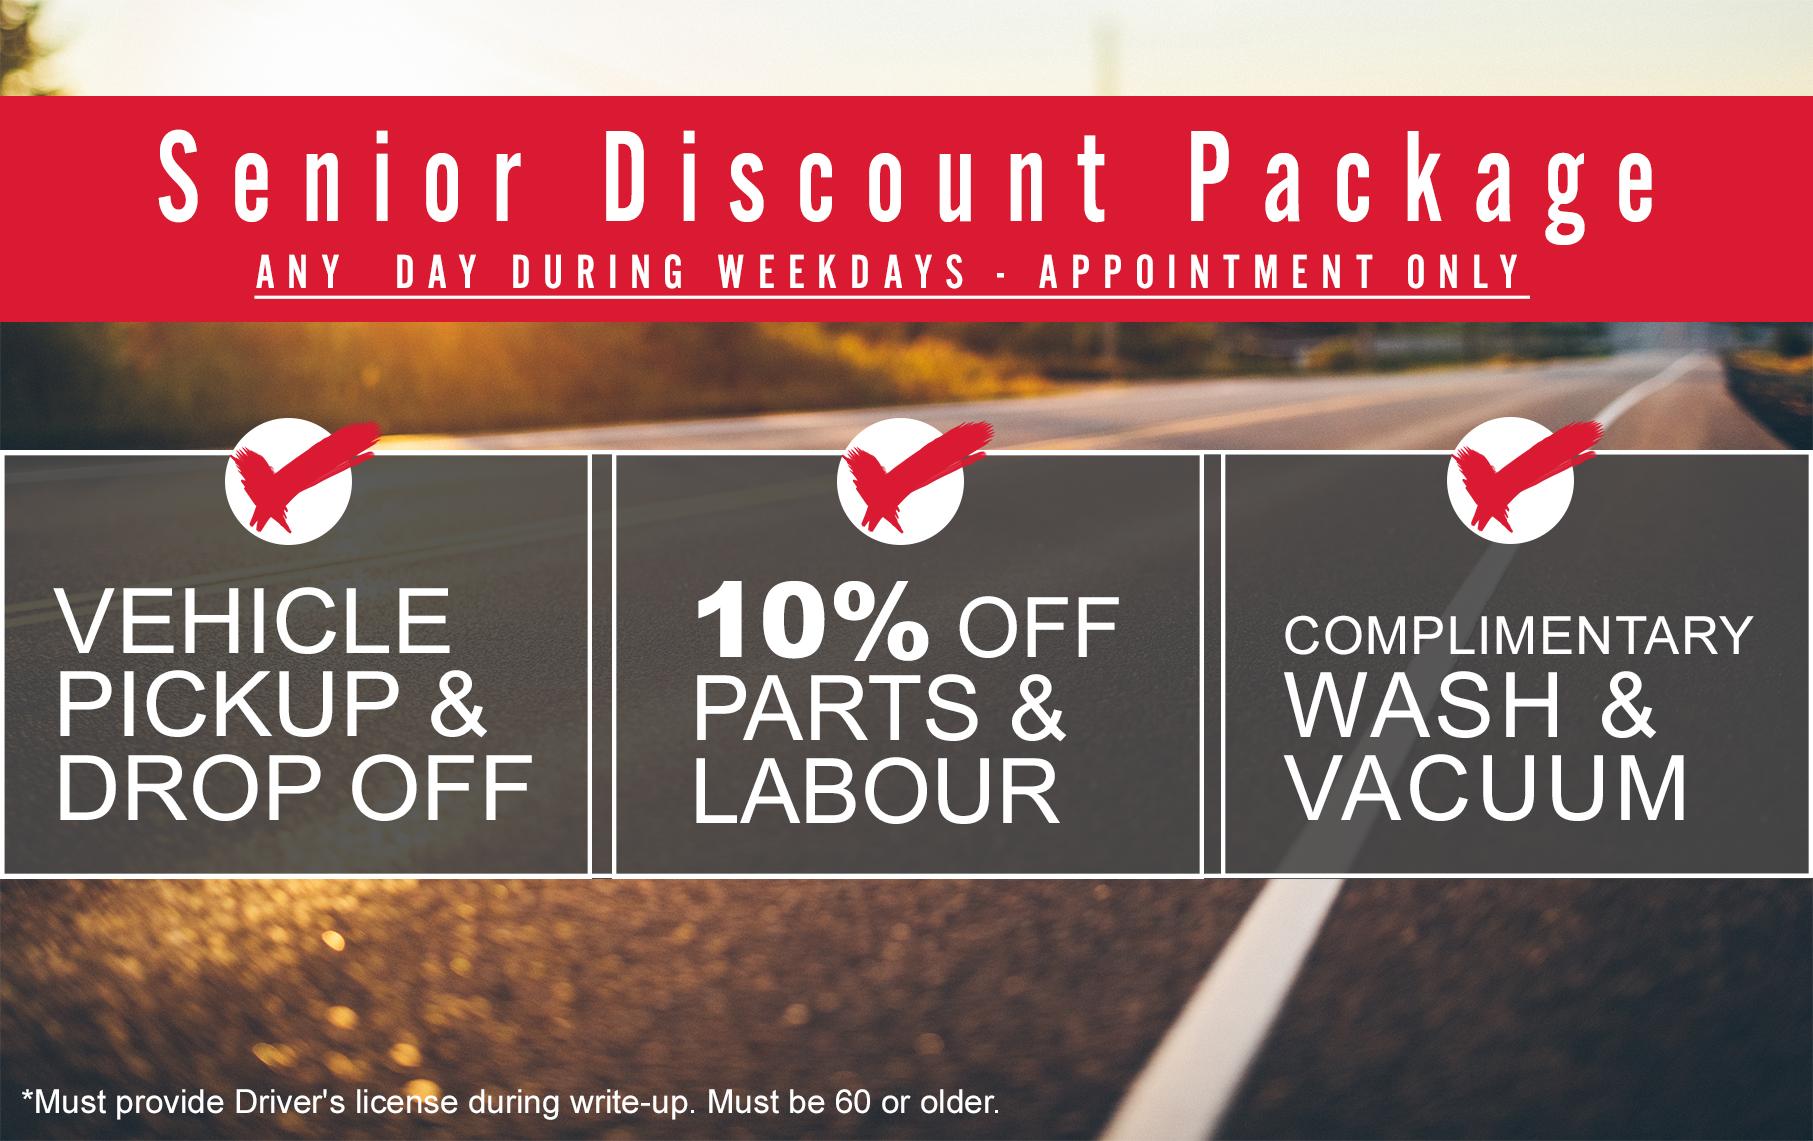 Senior Discount Package